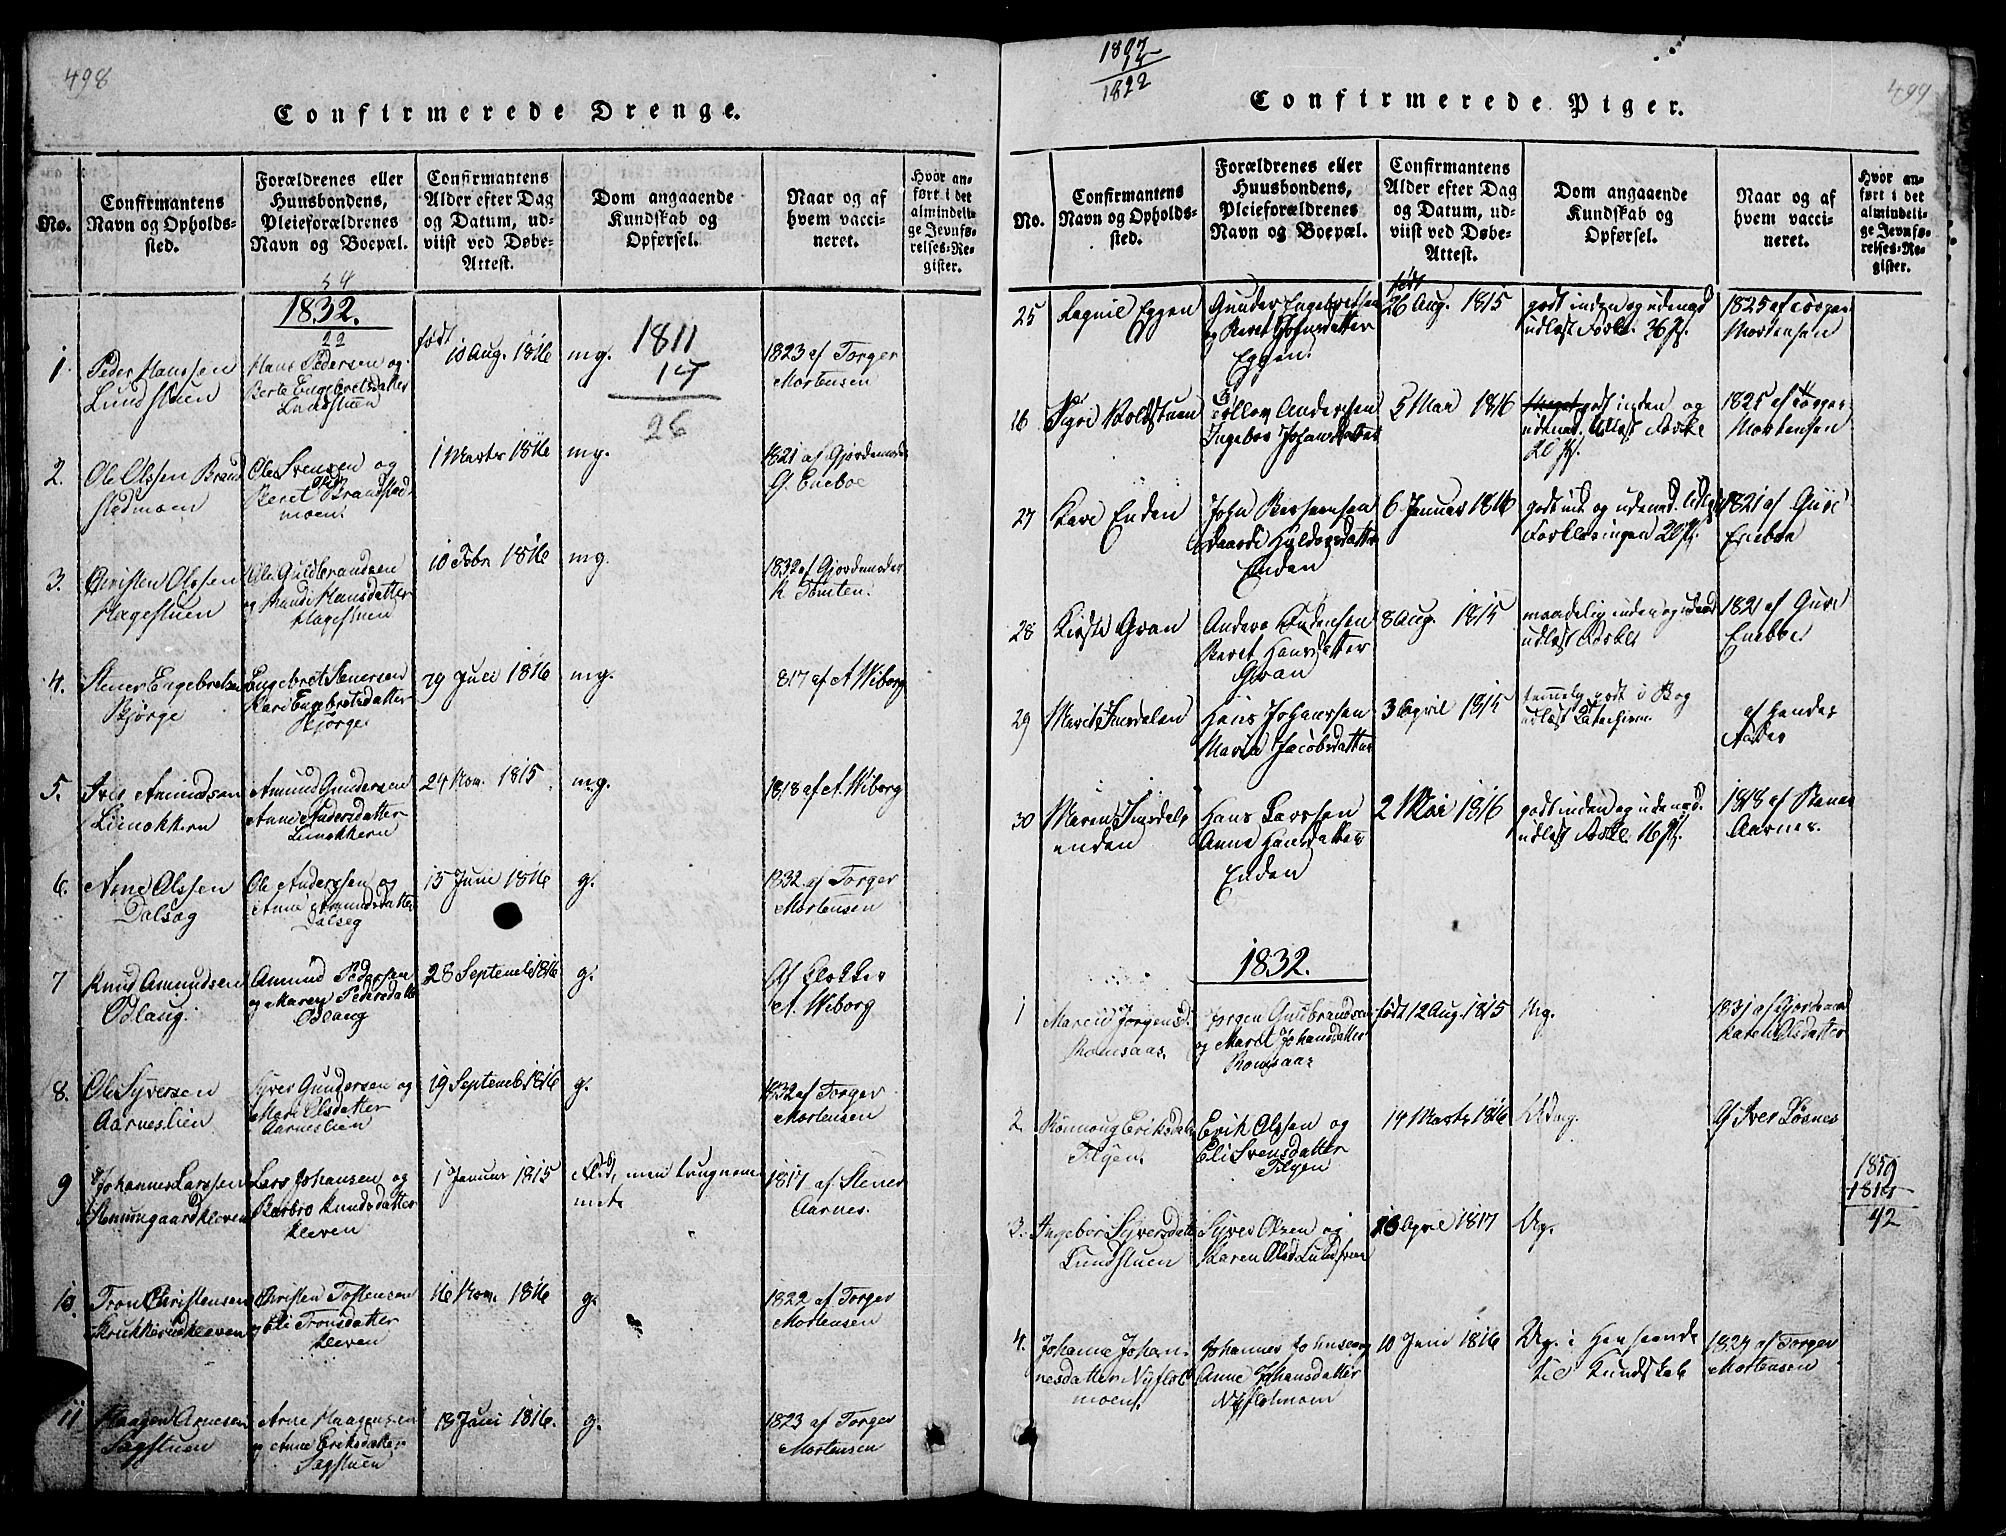 SAH, Ringebu prestekontor, Klokkerbok nr. 1, 1821-1839, s. 498-499